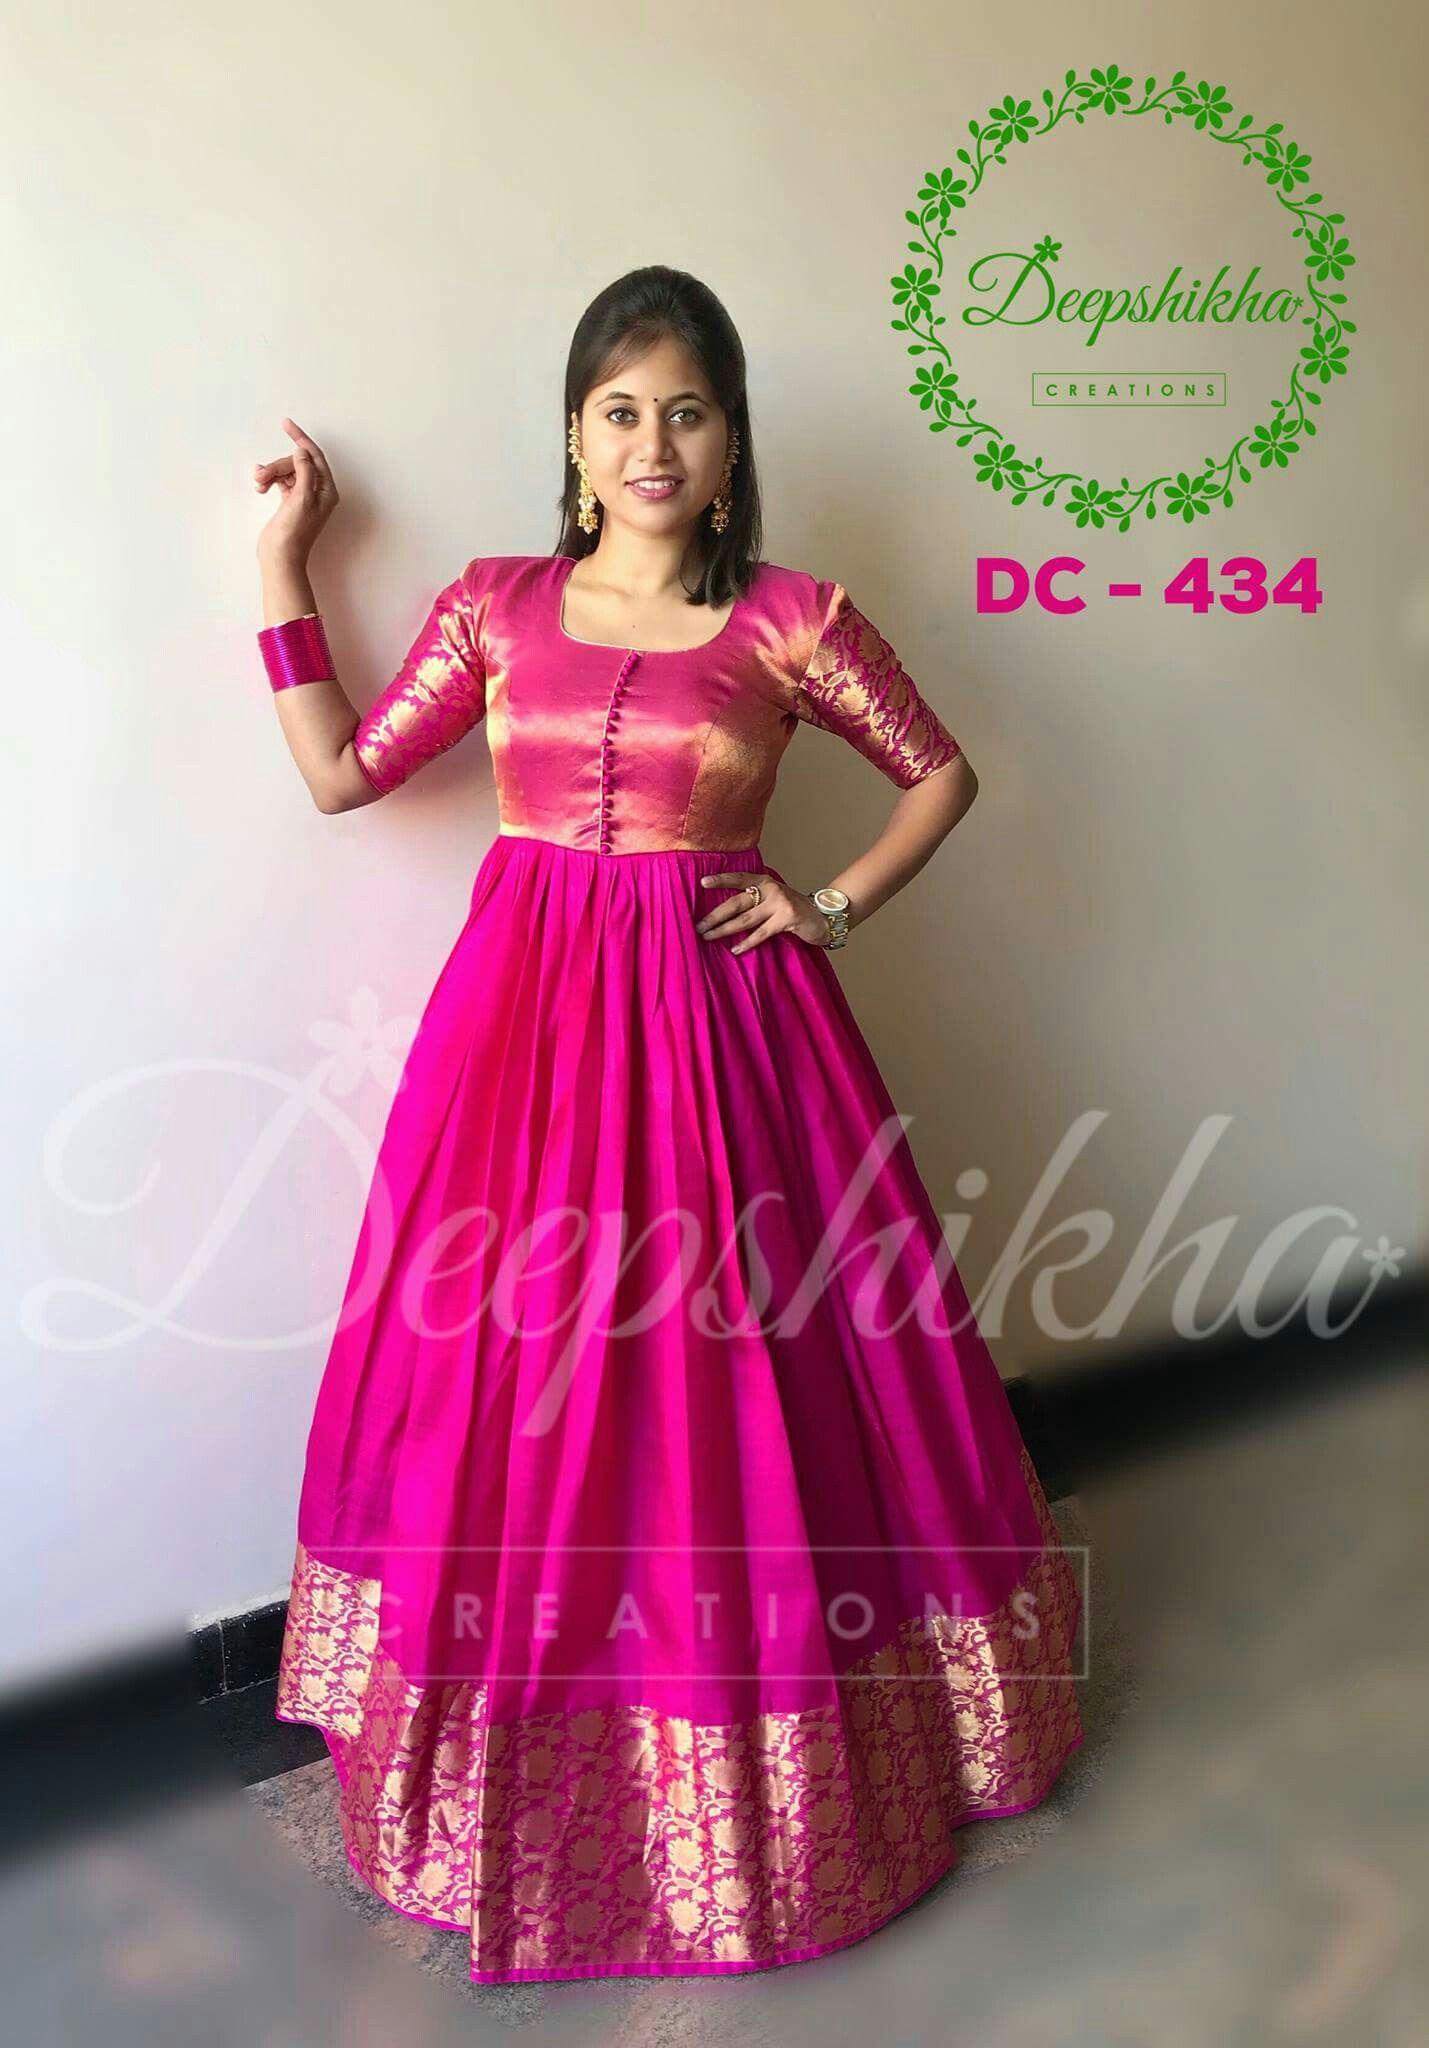 Pin de Himali Patel en dress style | Pinterest | Vestiditos